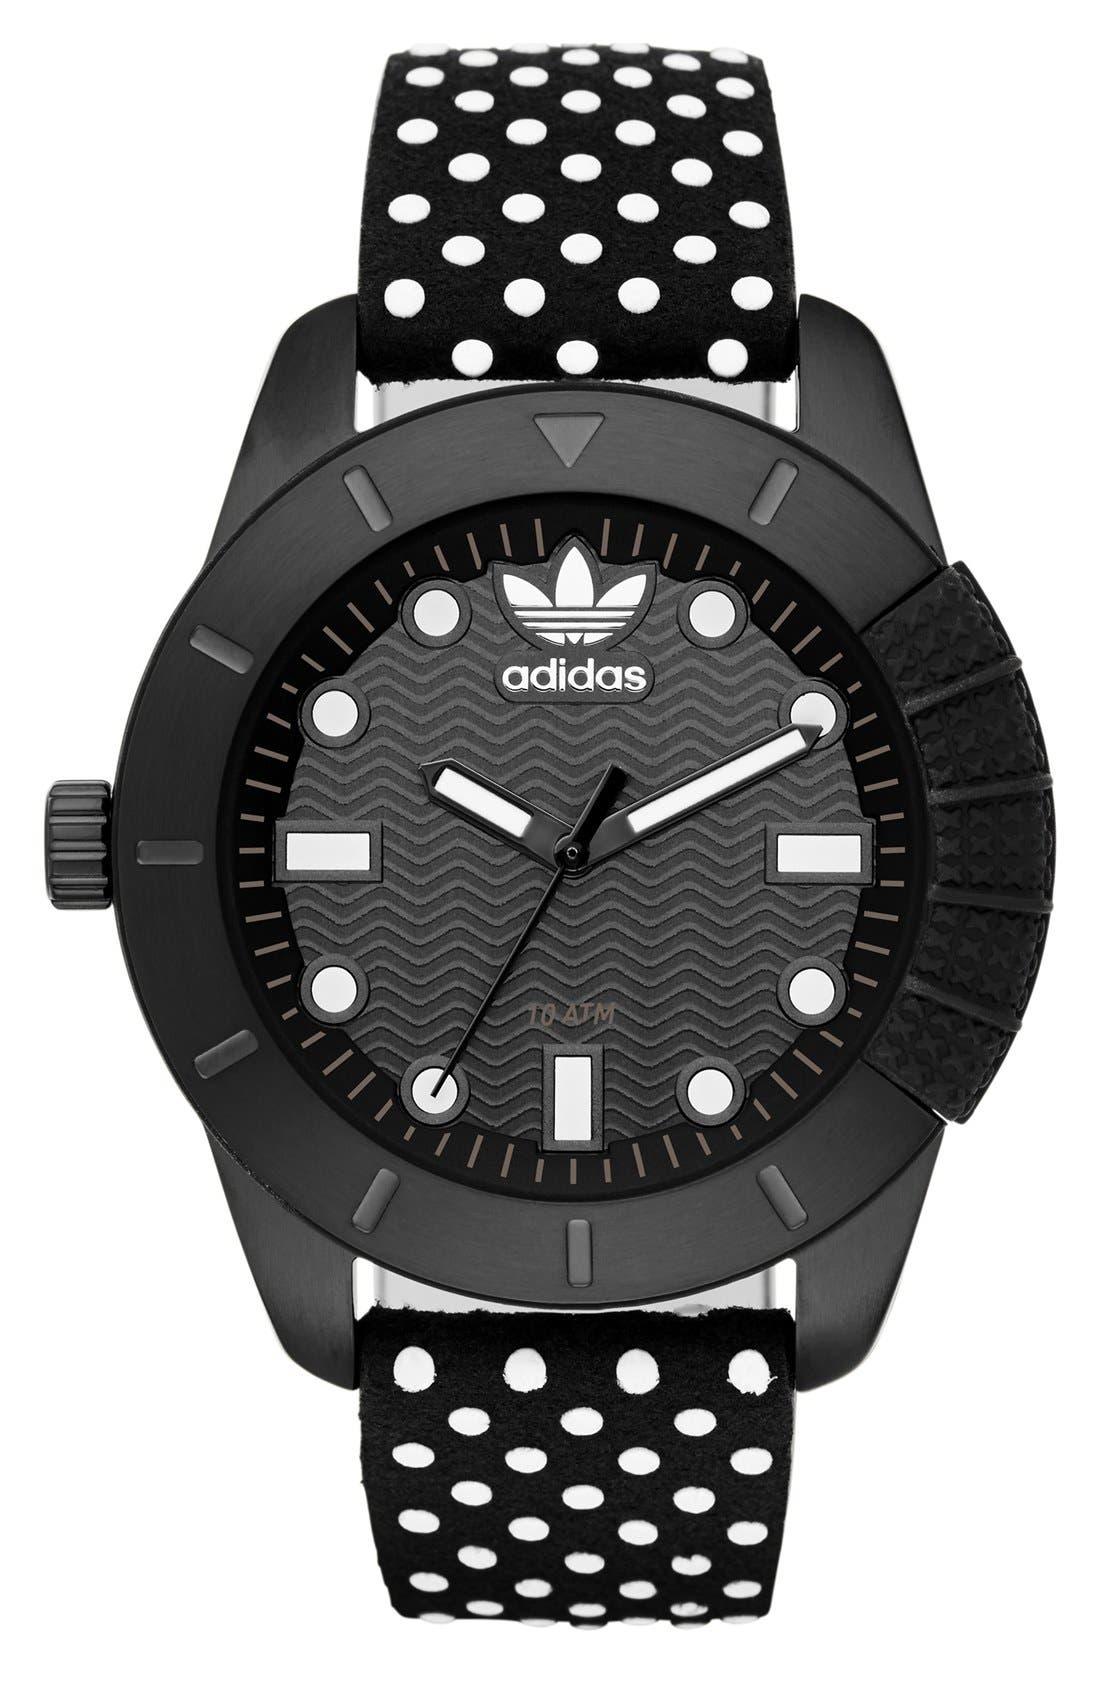 Main Image - adidas Originals 'ADH-1969' Leather Strap Watch, 42mm